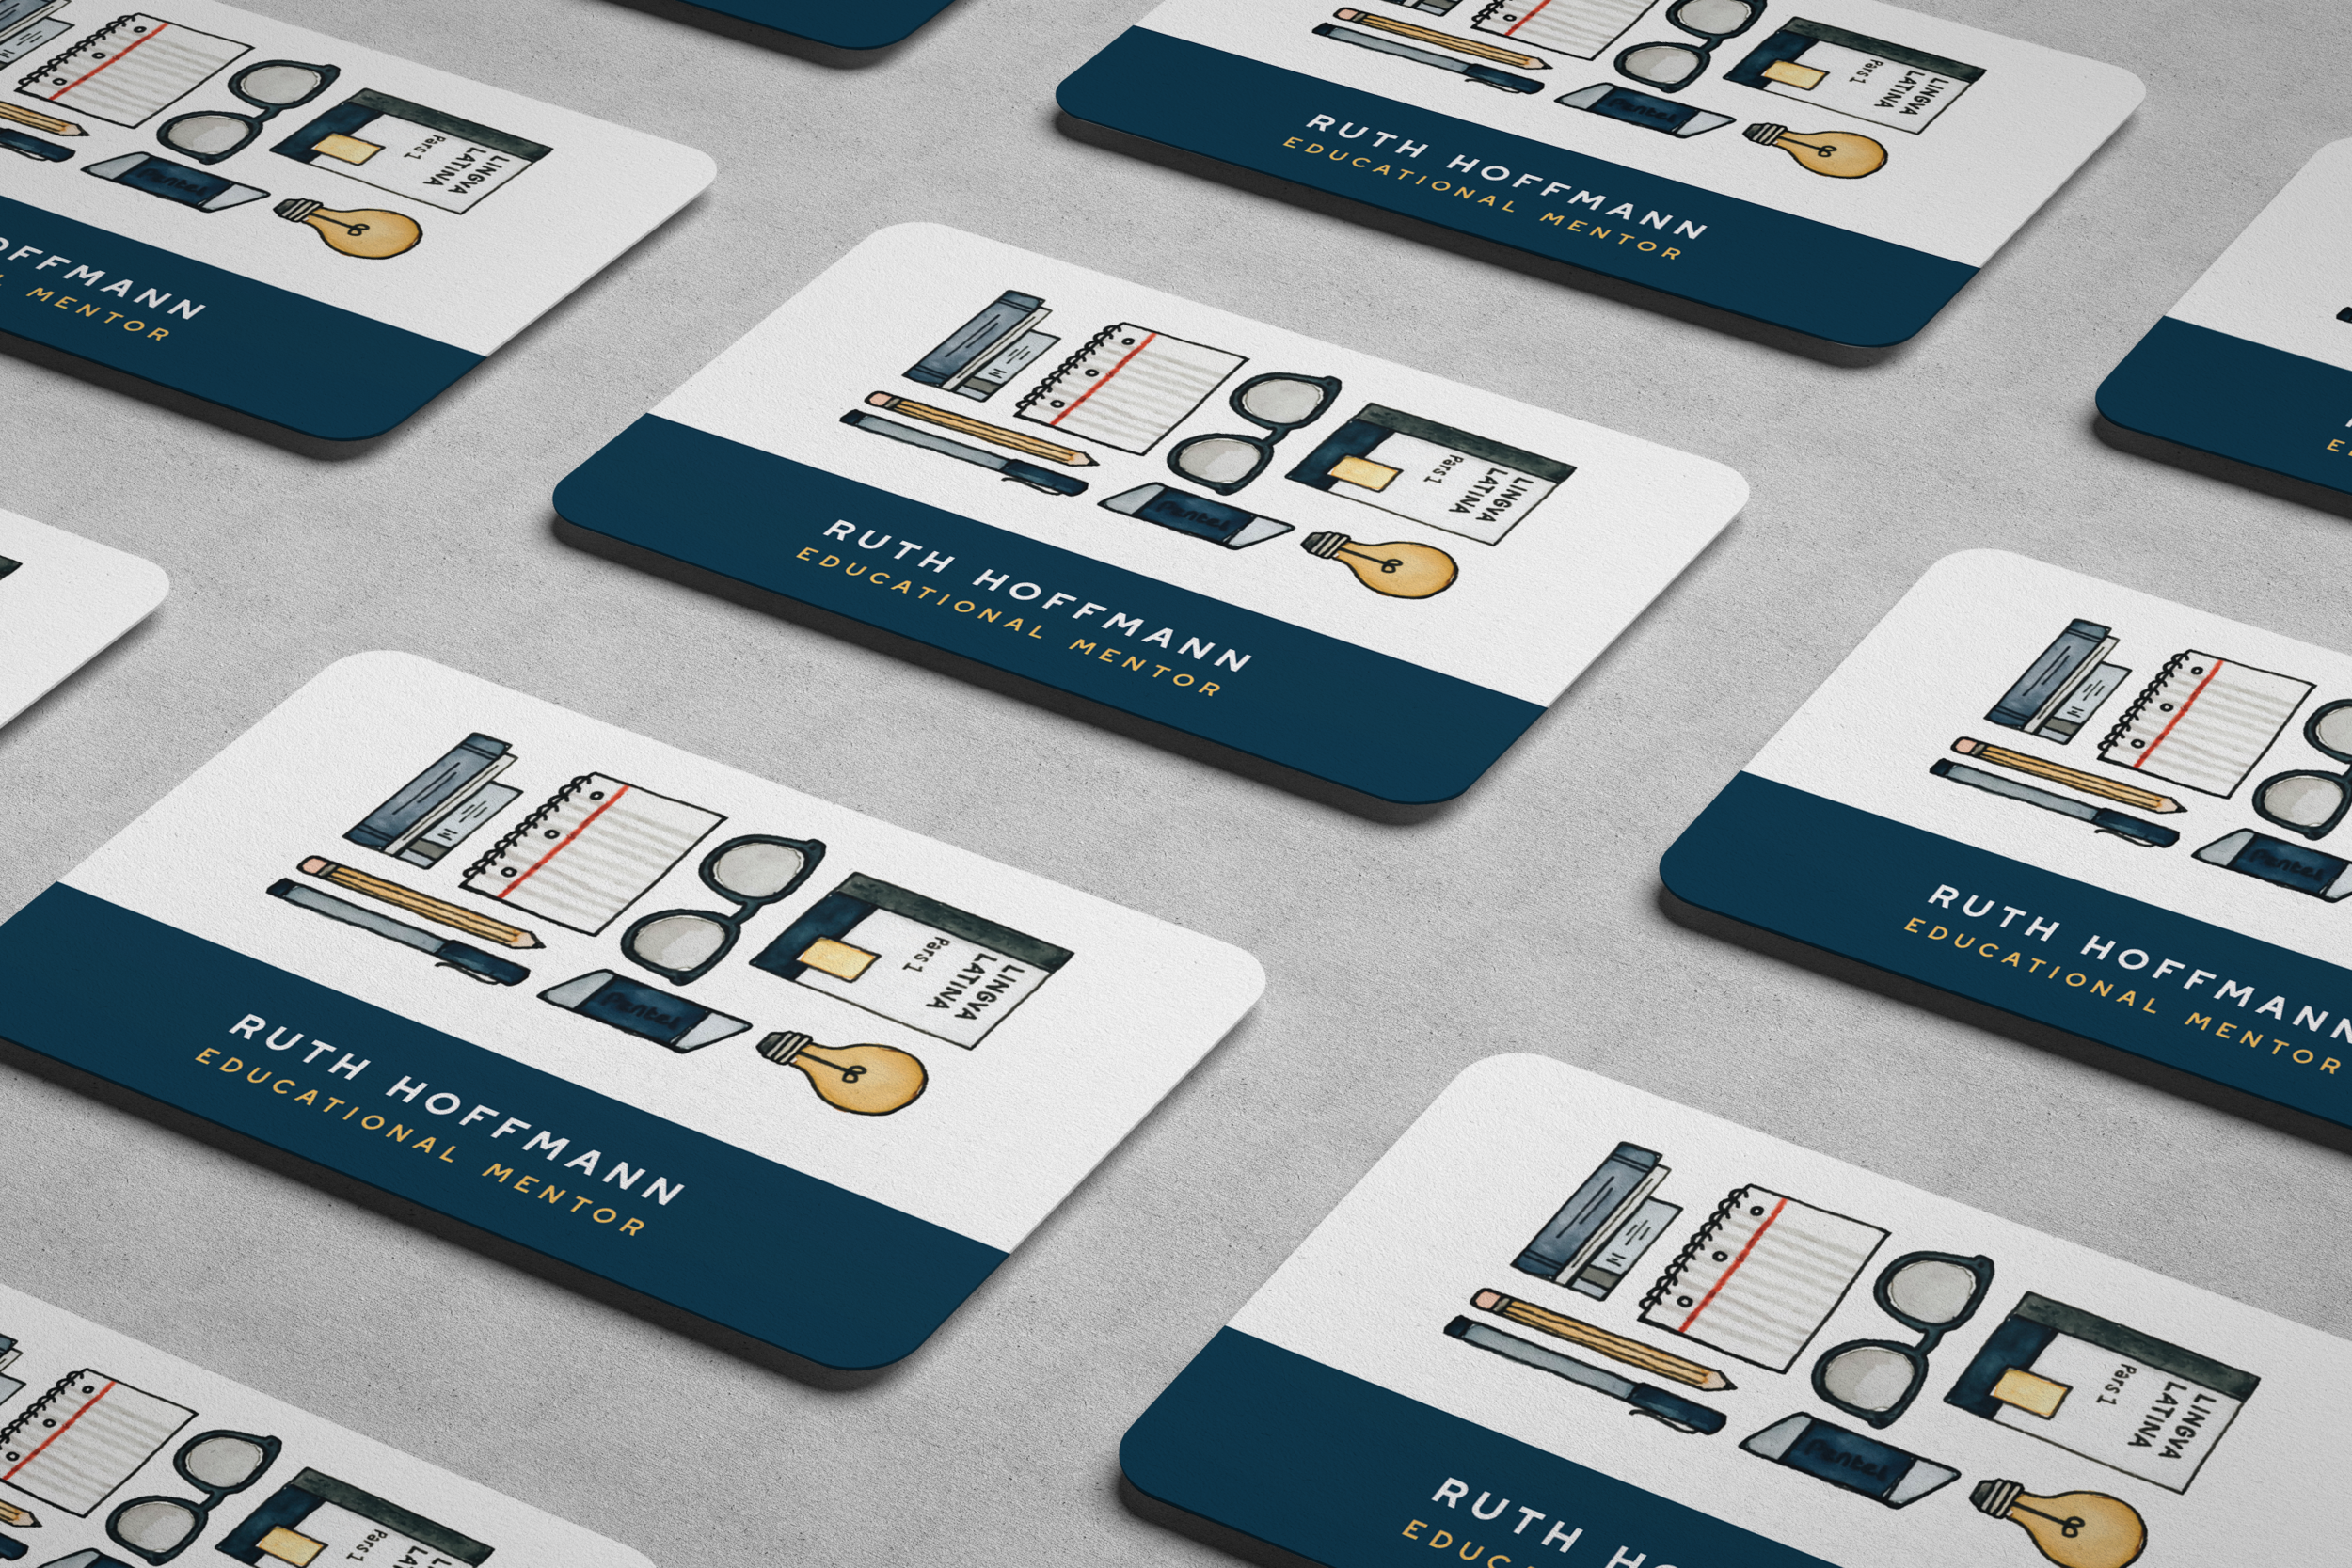 Business_Card_Mockup_2 blue front.png